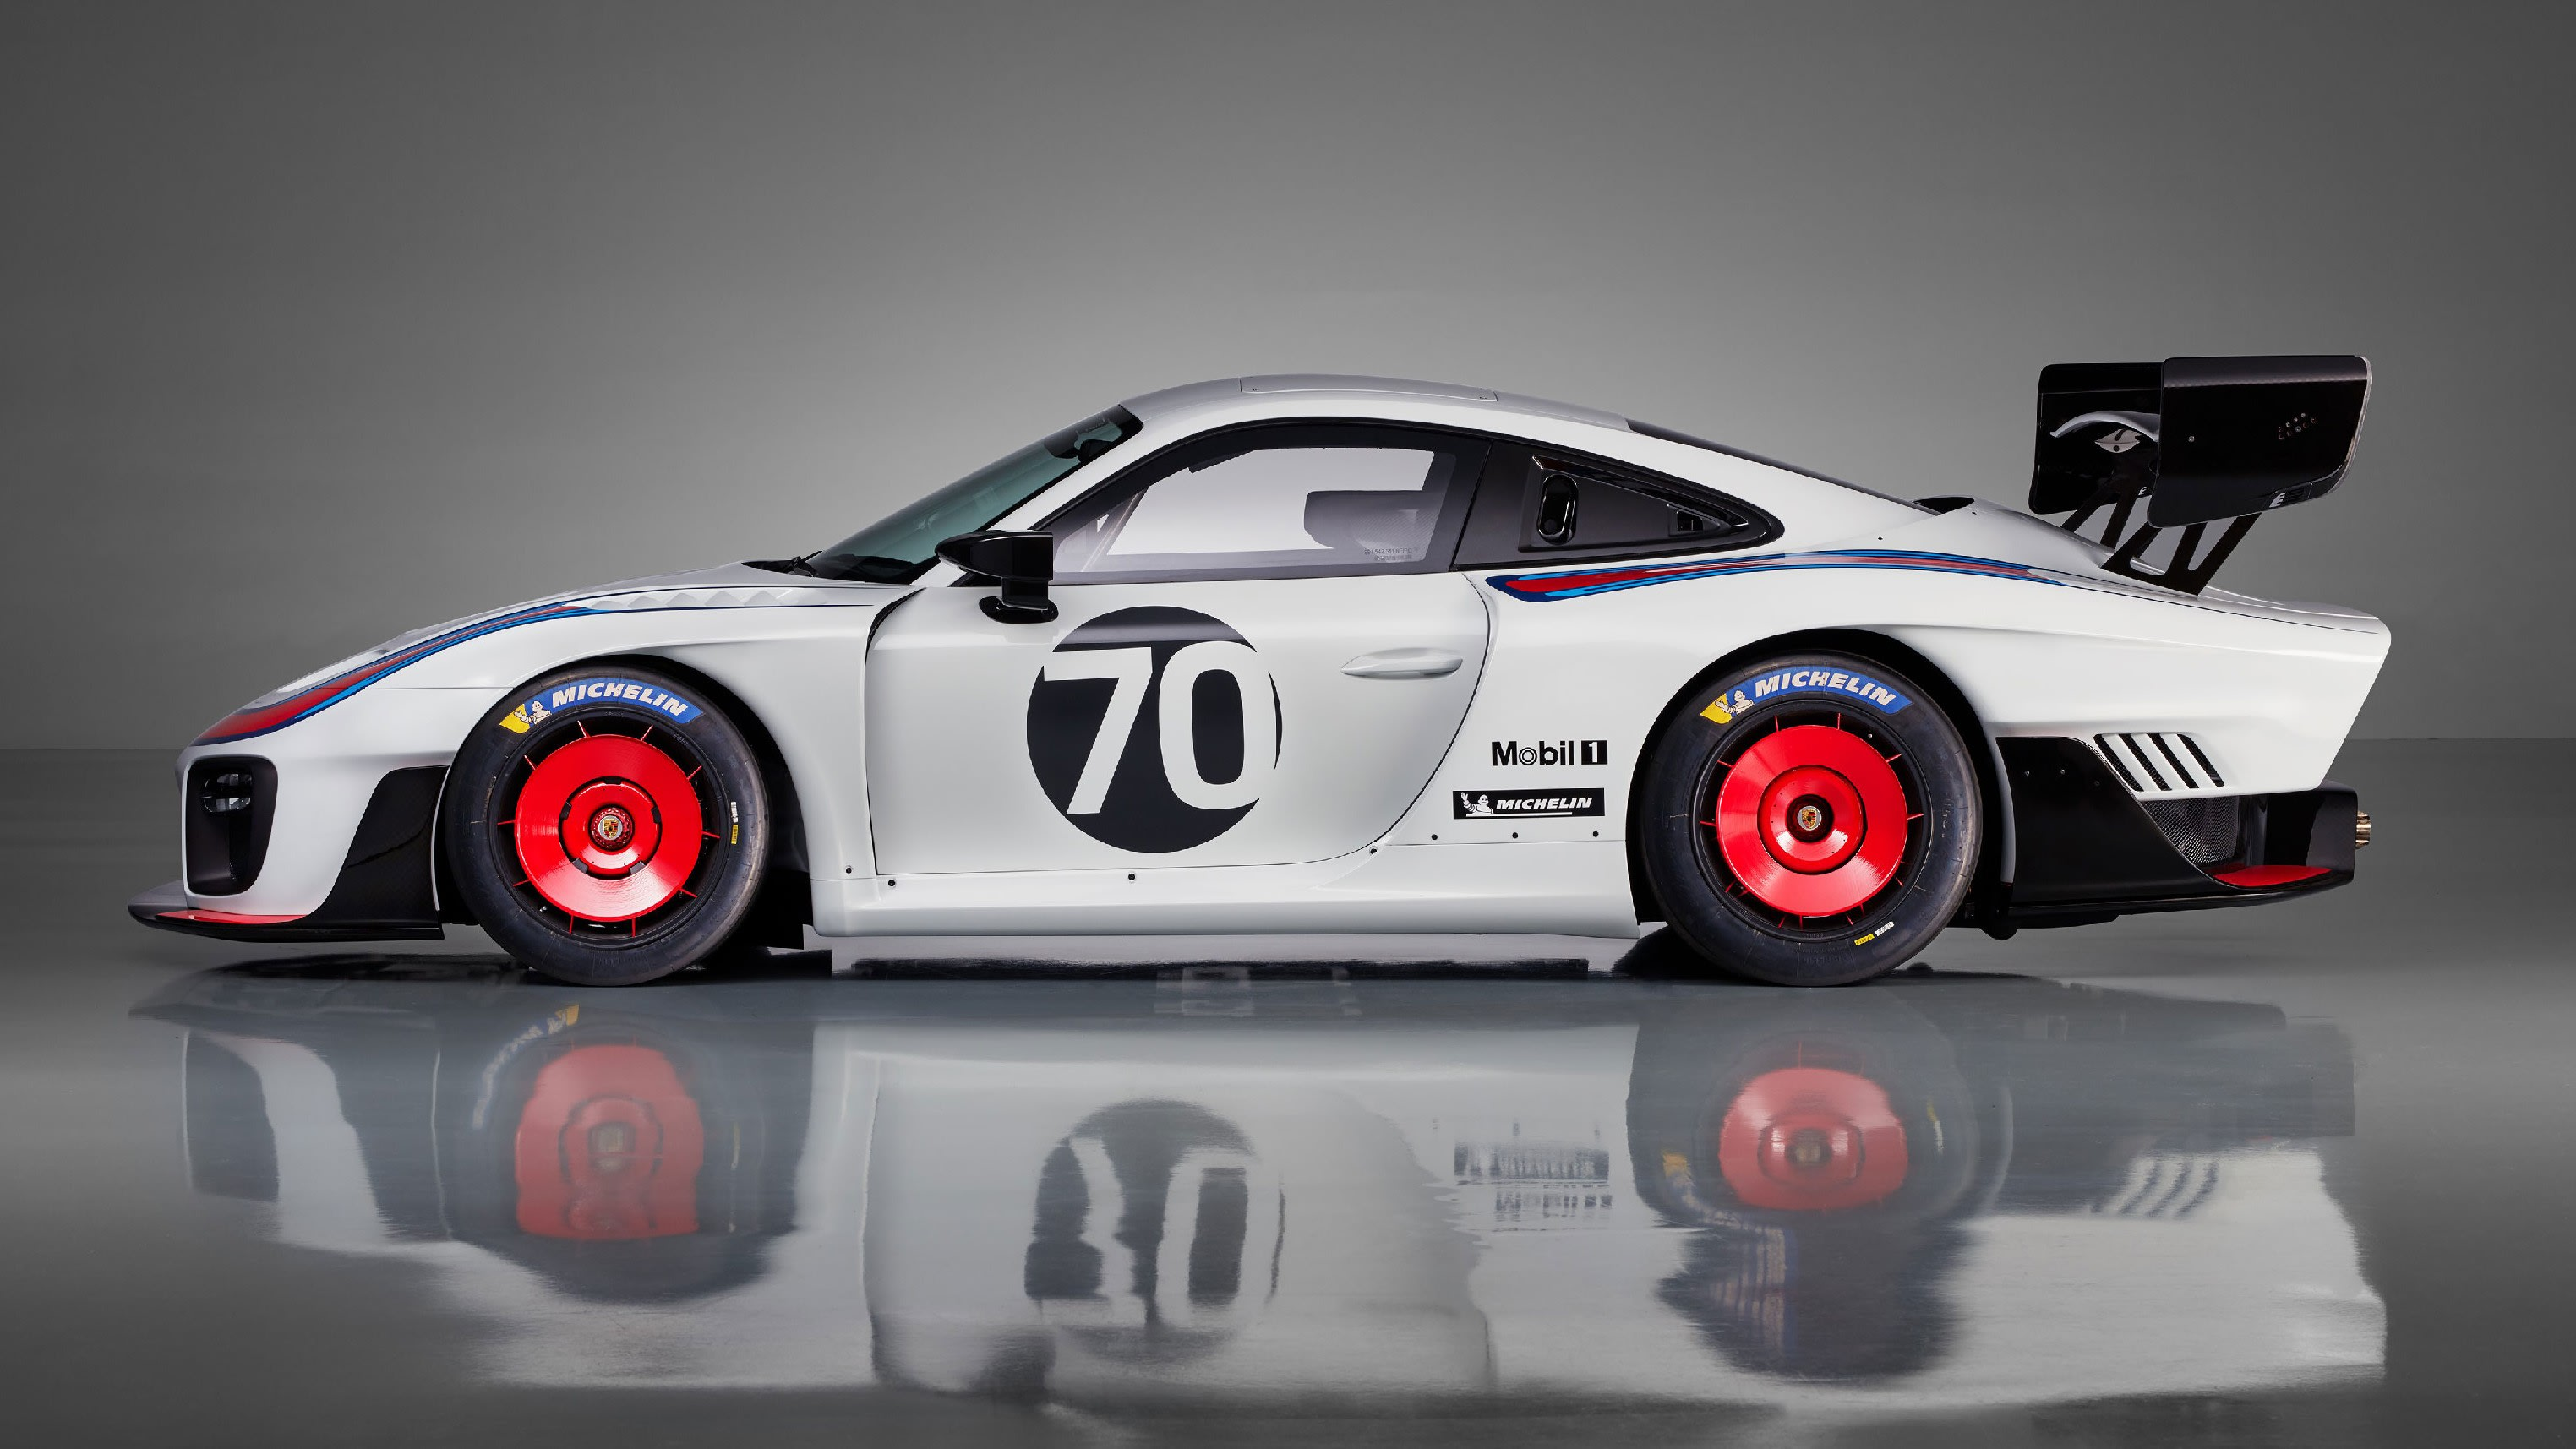 Porsche 935 Race Car Coming To Australian F1 Grand Prix Caradvice